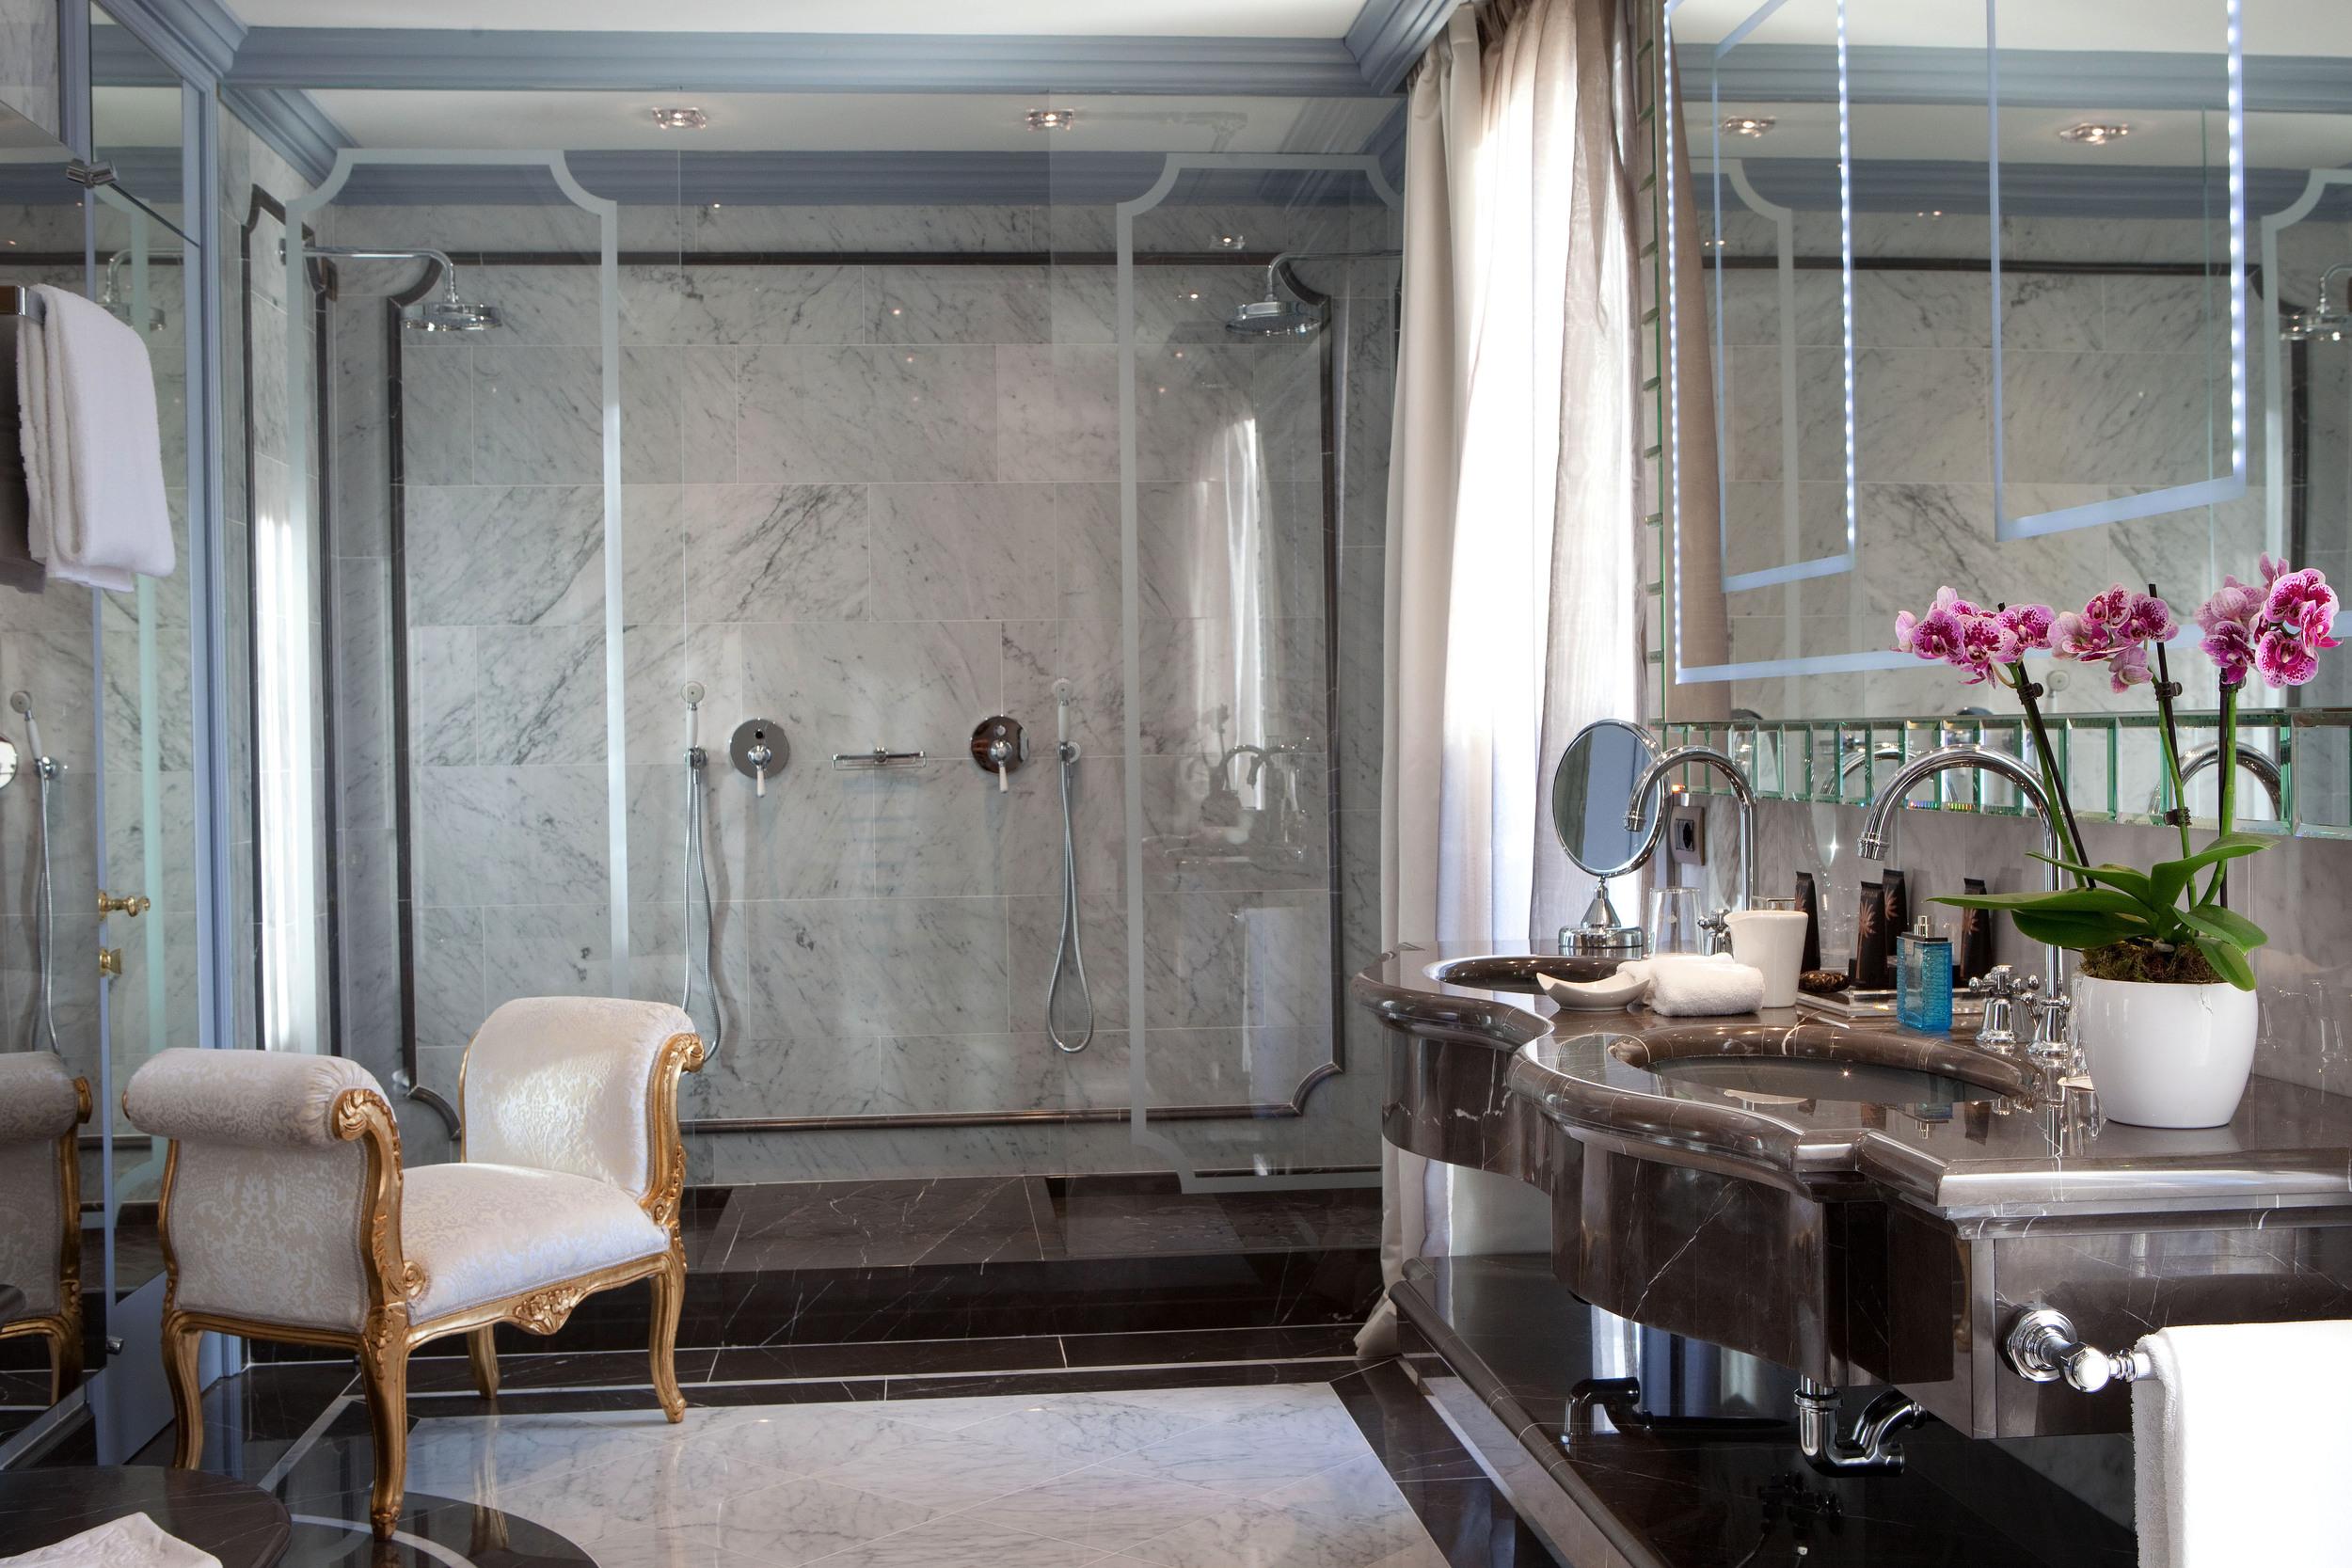 The brand new San Giorgio terrace suite was just unveiled at the  Luna Hotel Baglioni  in Venice